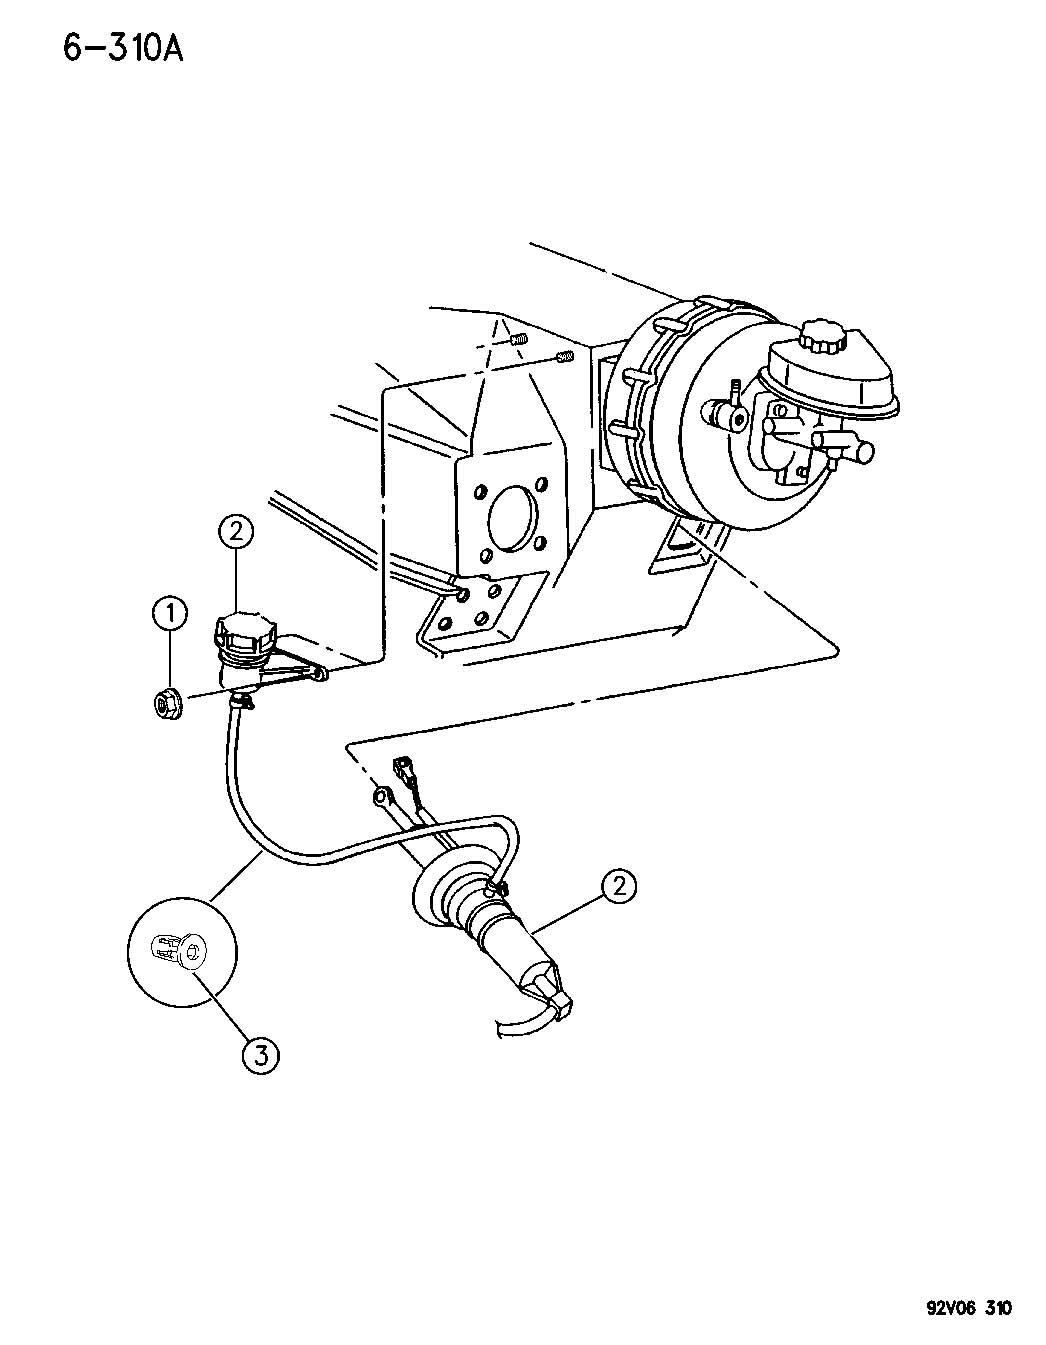 Dodge Viper Actuator Hydraulic Clutch Actuation System Clutch